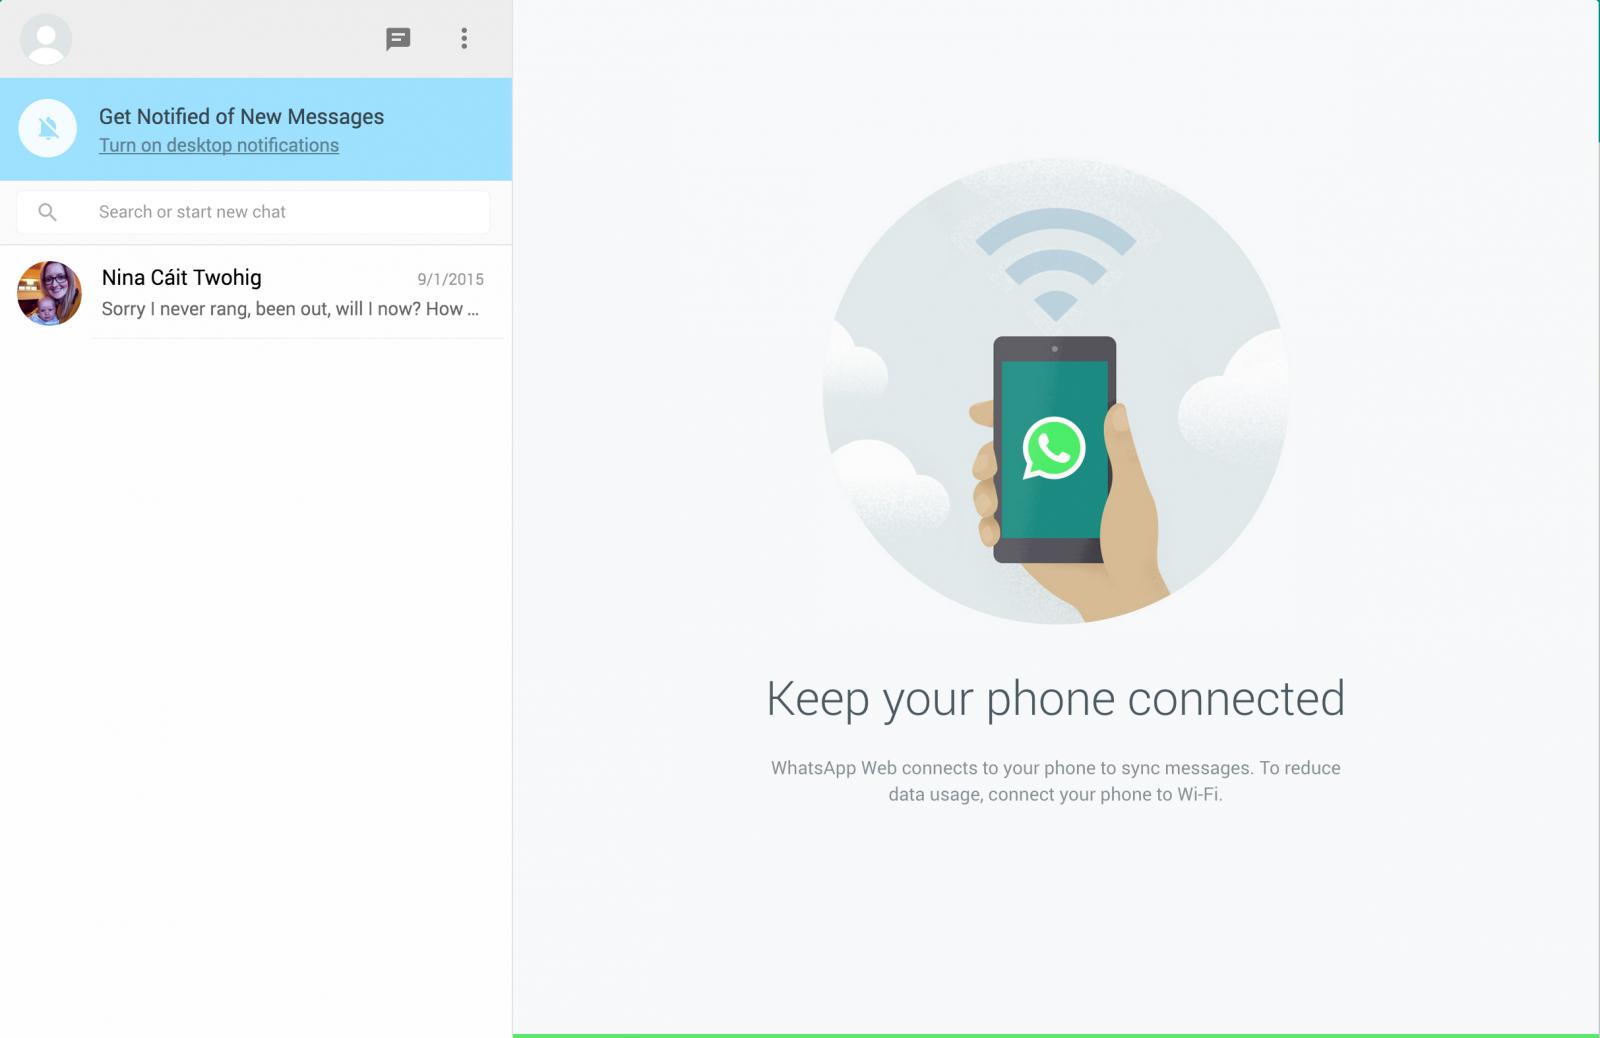 WhatsApp Web: How to use WhatsApp on a PC